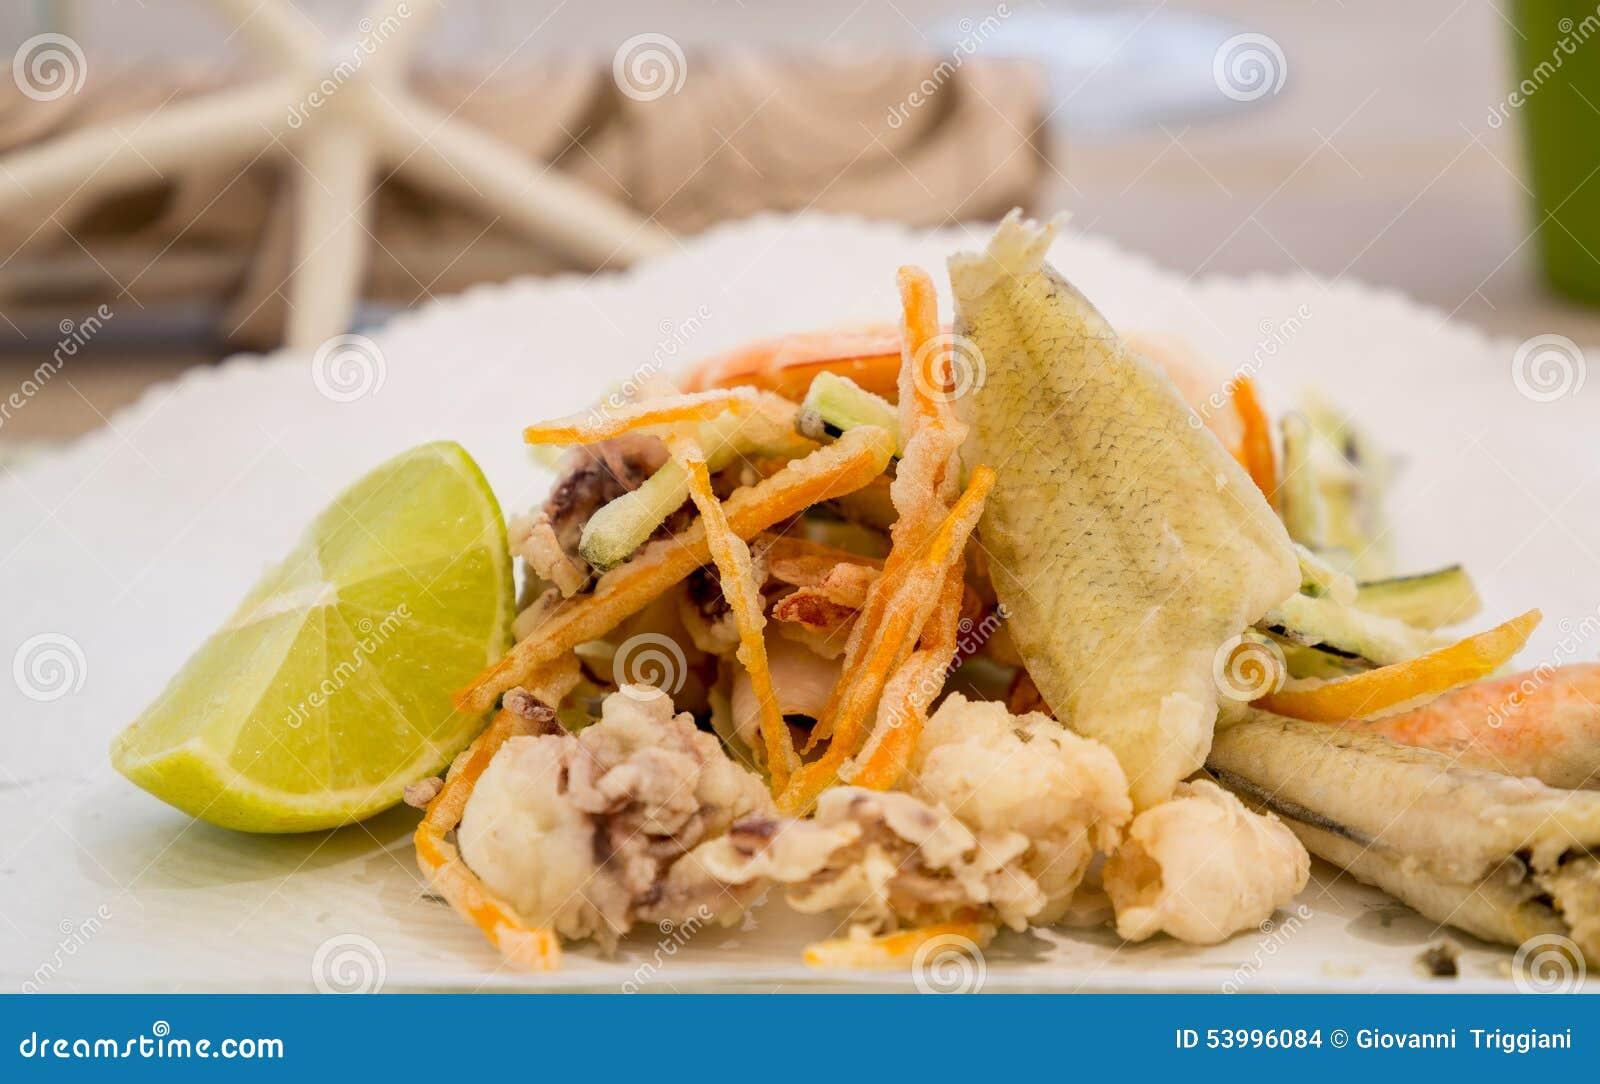 Fresh mixed fried fish